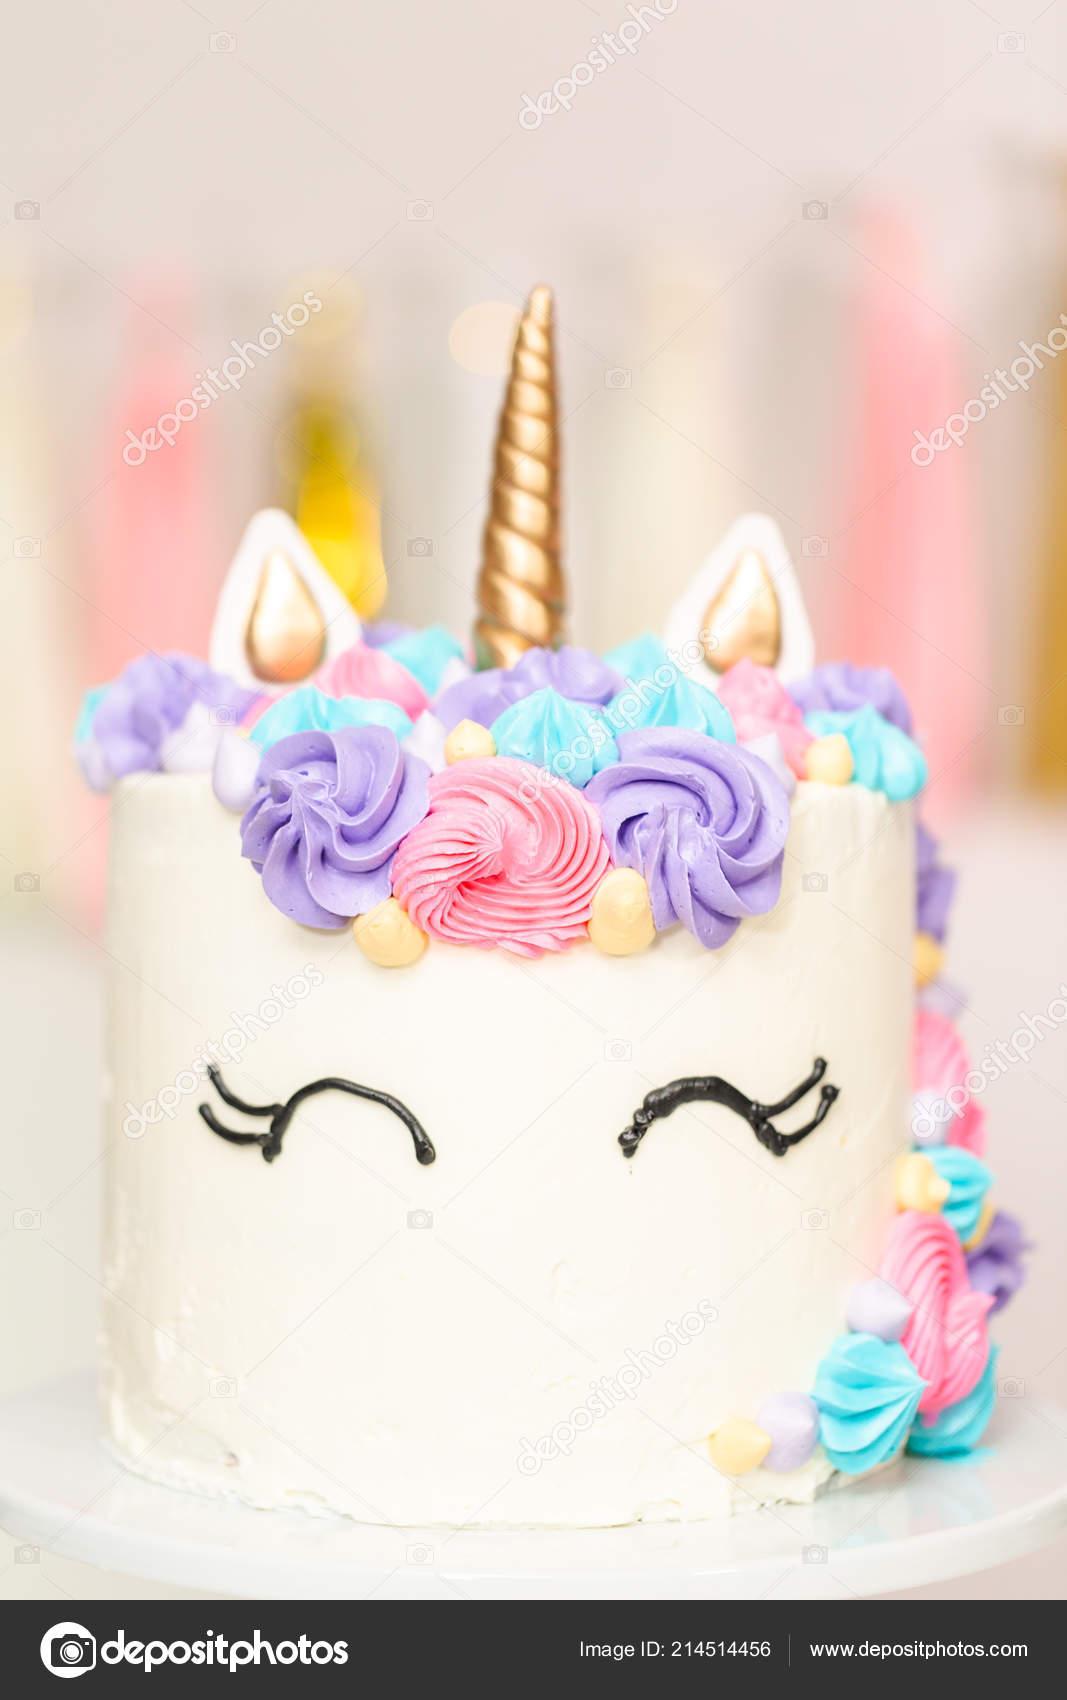 Pastel Unicornio Decorado Con Glaseado Crema Mantequilla